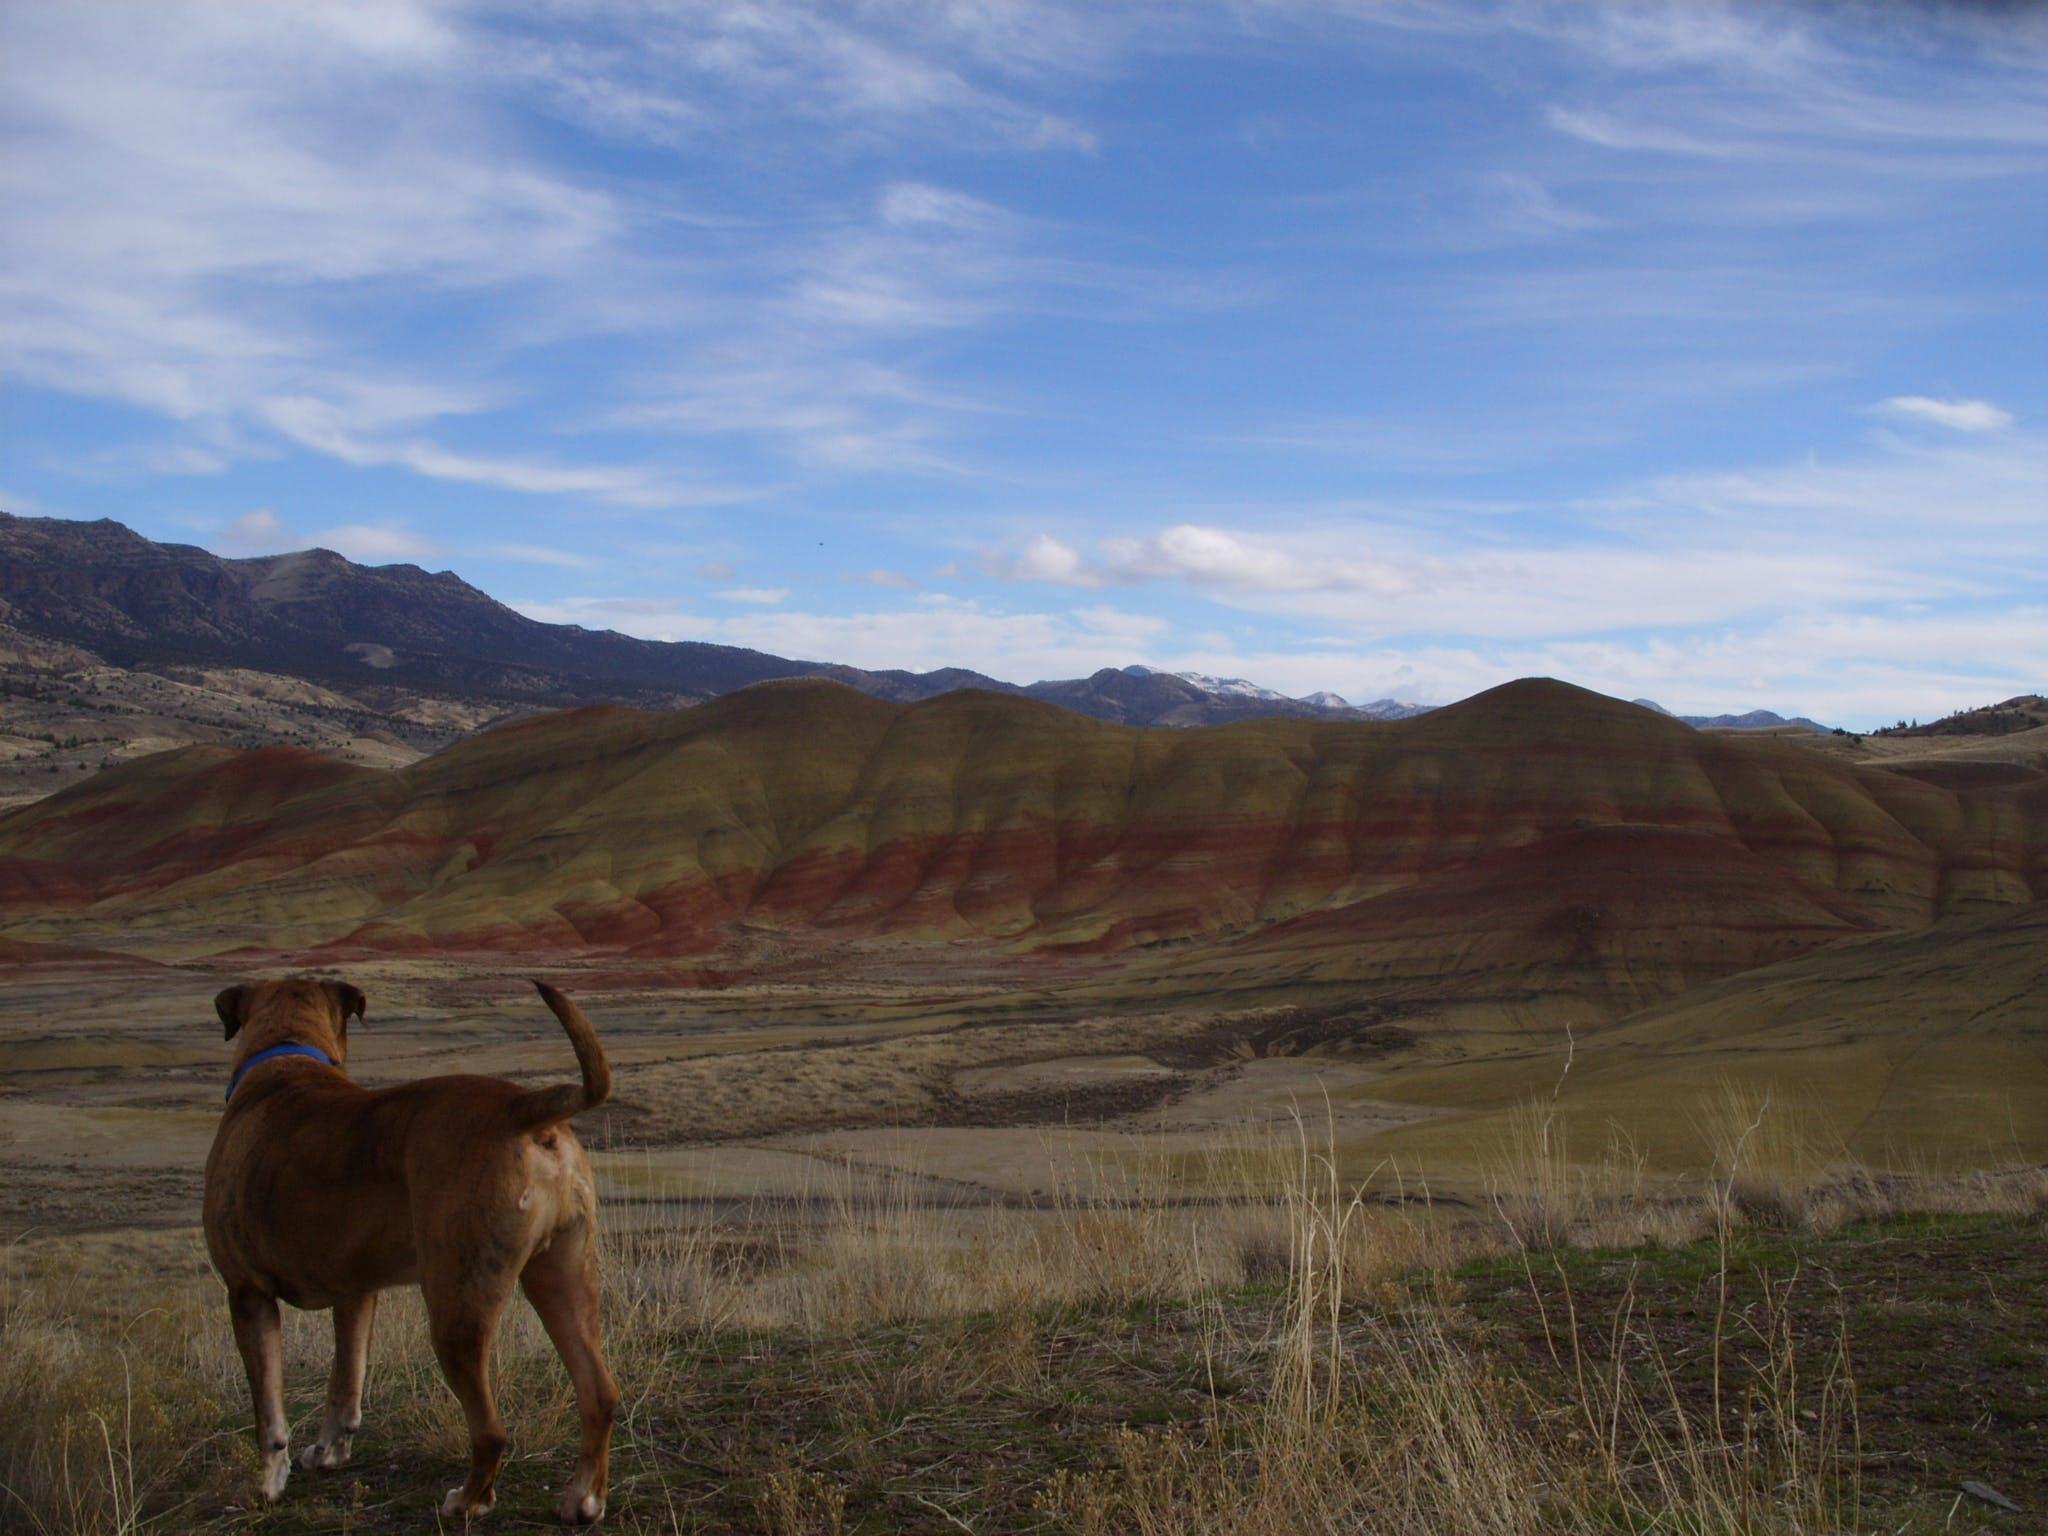 Free stock photo of Painted Hills, Joe Leineweber